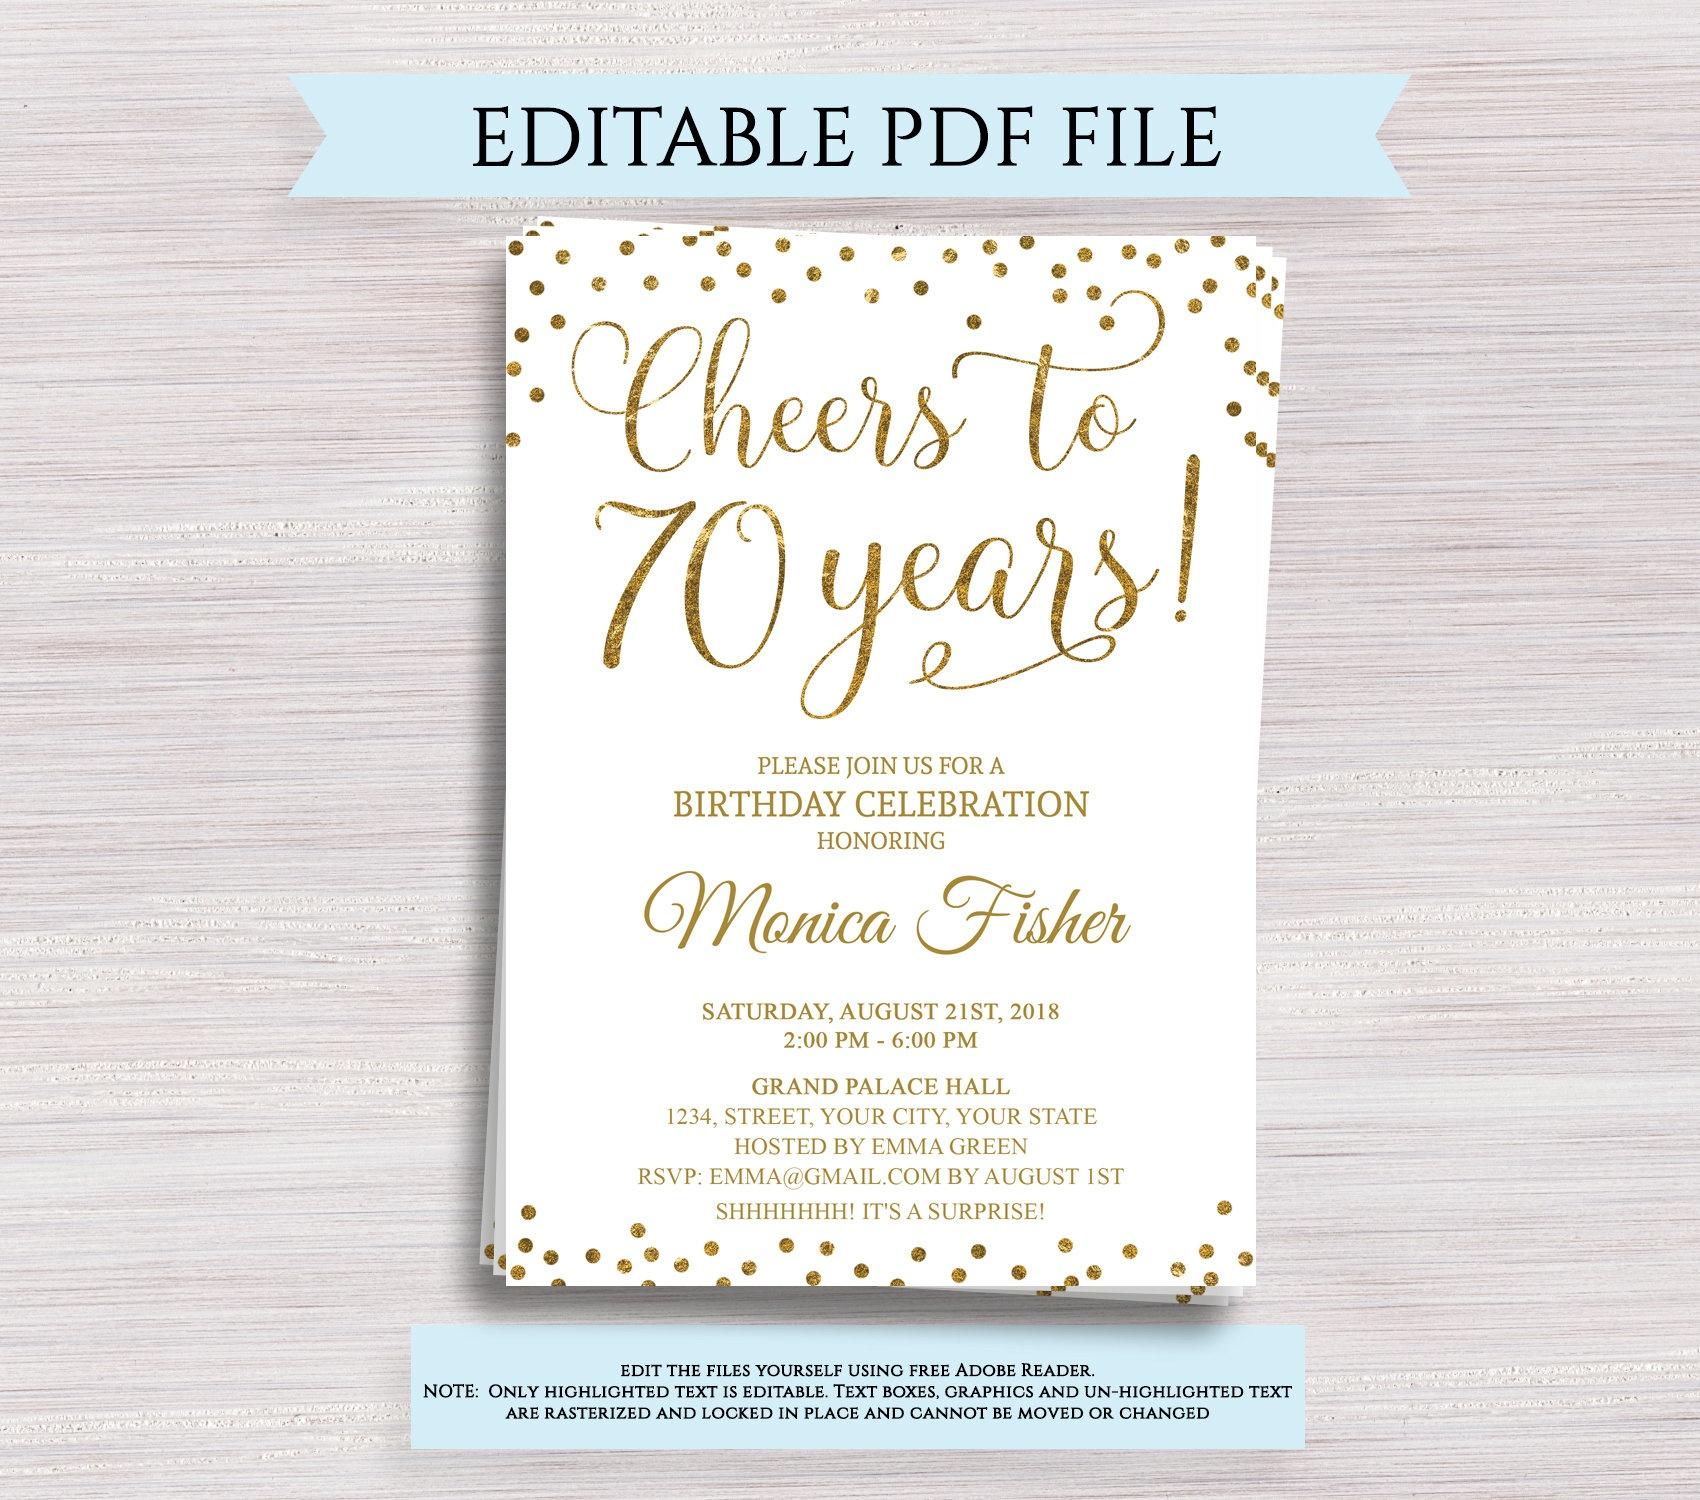 Editable 70Th Birthday Party Invitation Template Cheers To 70 | Etsy - Free Printable 70Th Birthday Party Invitations